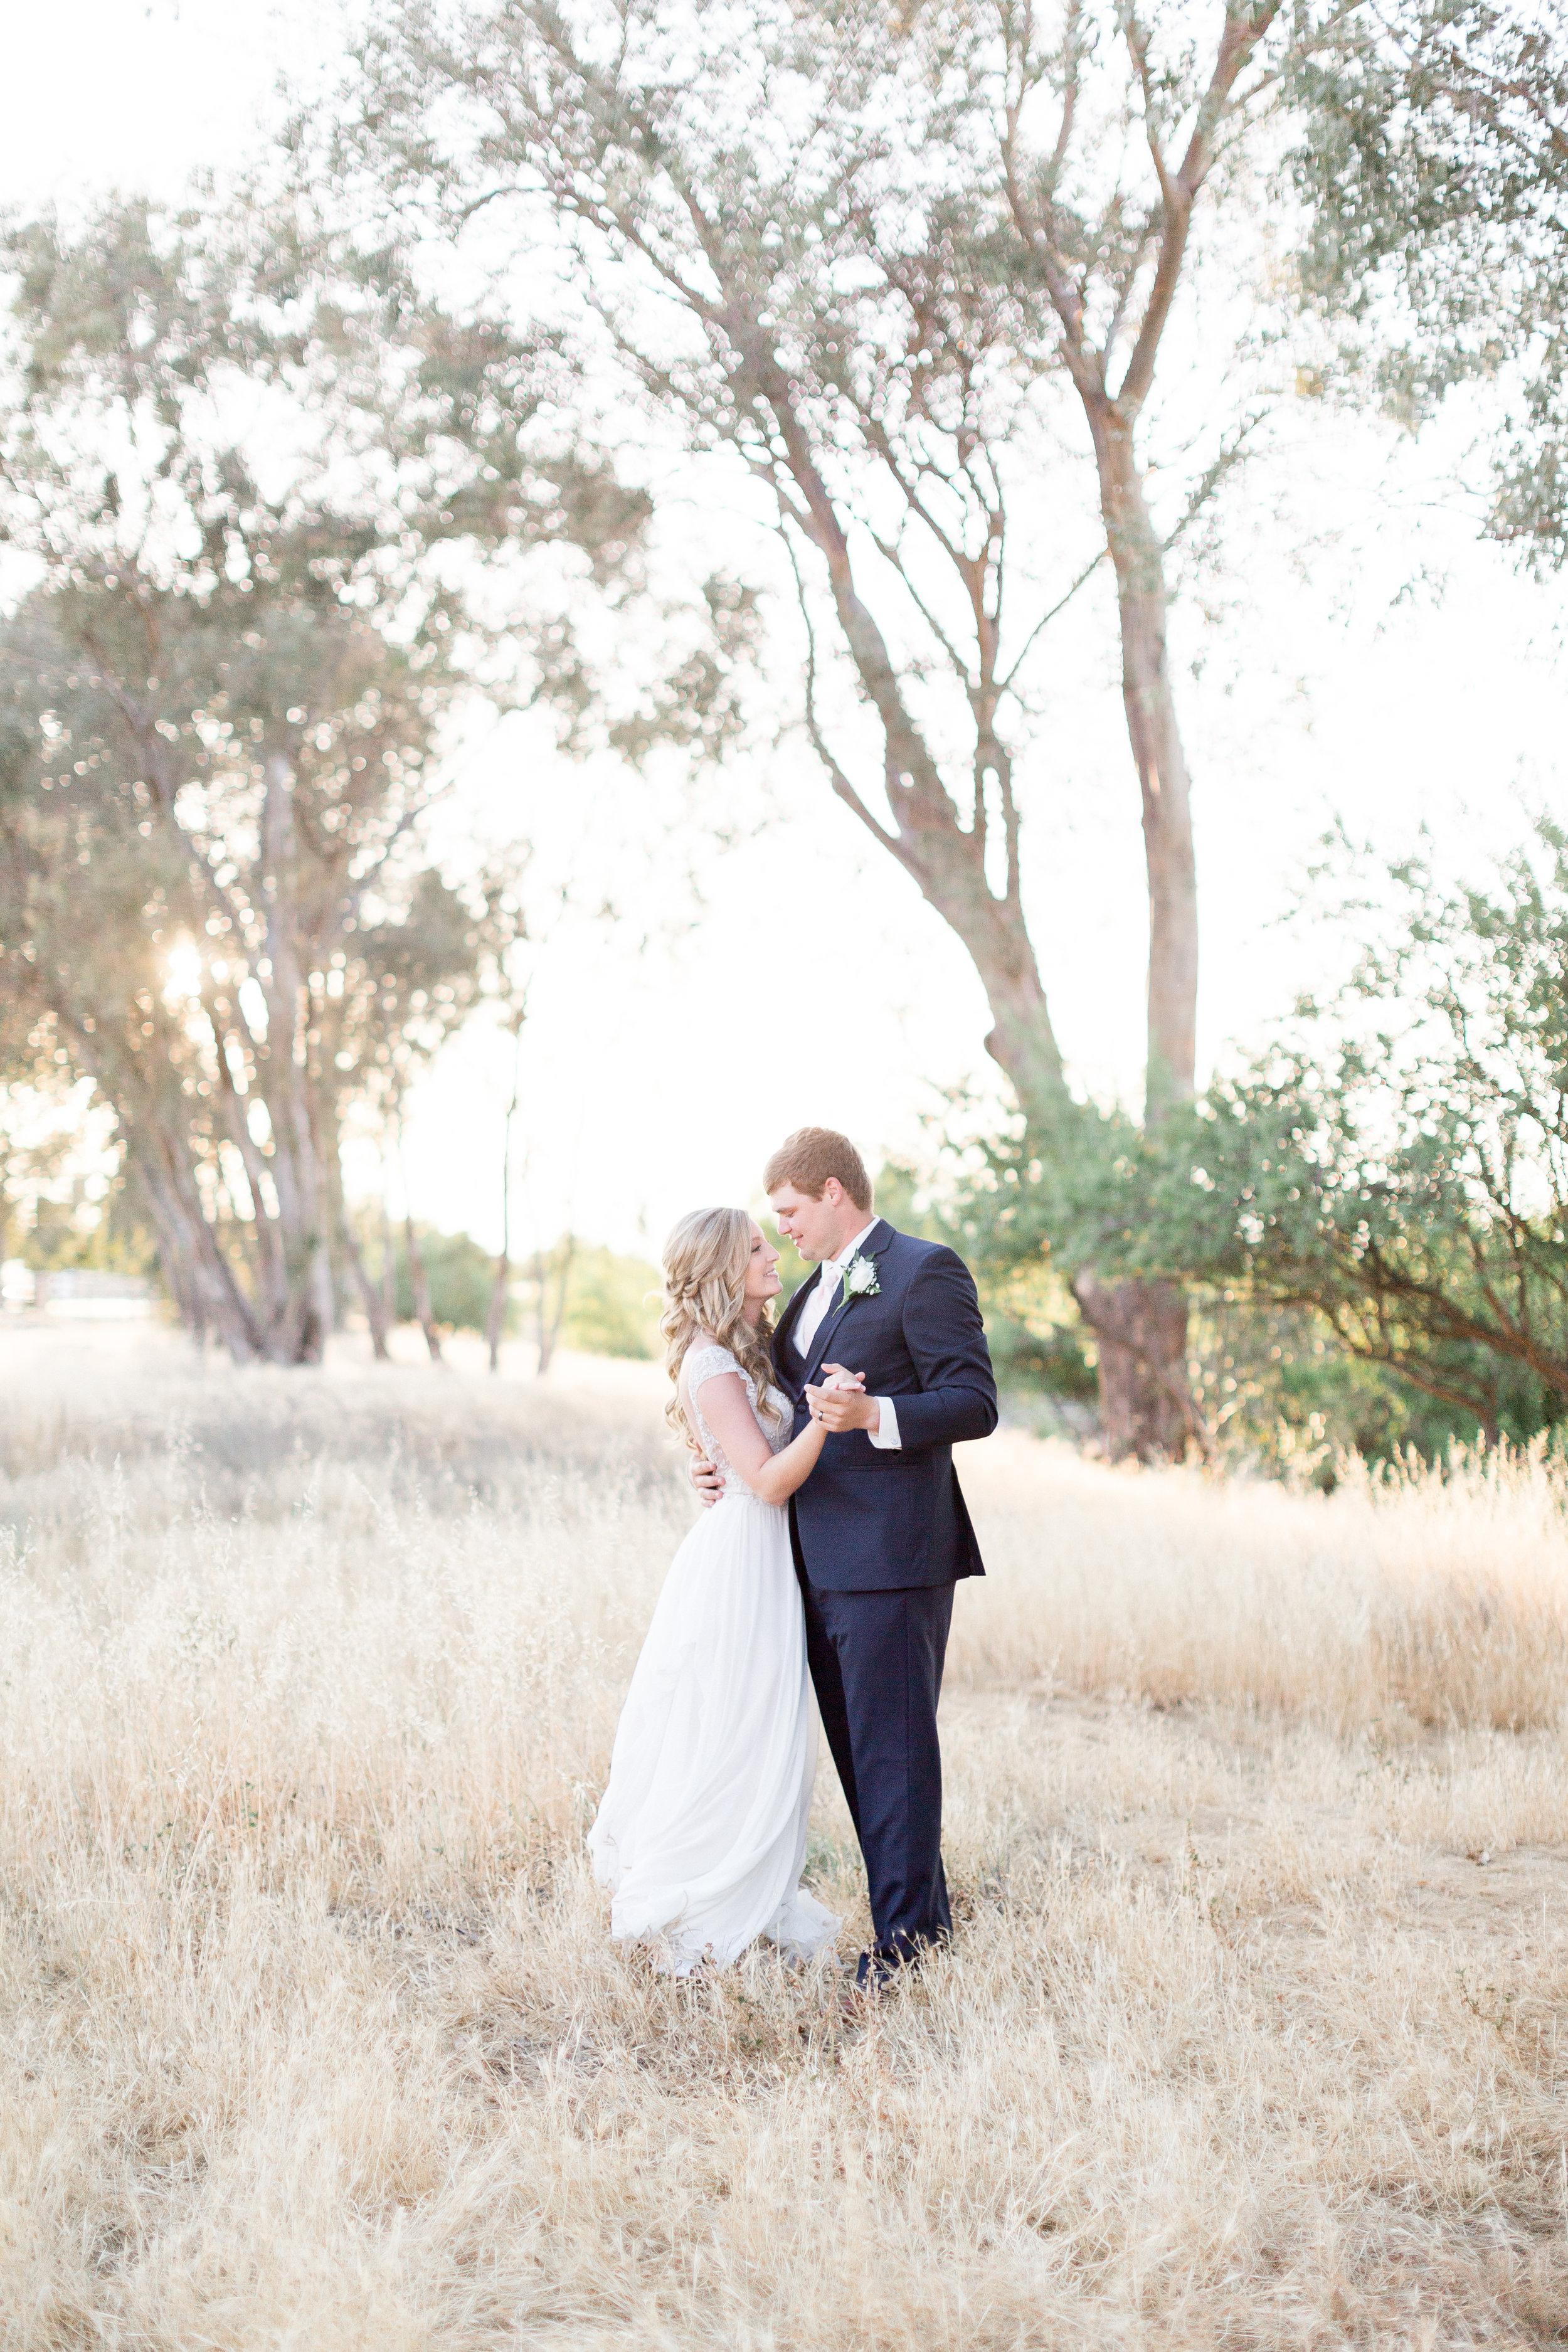 A-Private-Ranch-Northern-California-Wedding-1-2.jpg